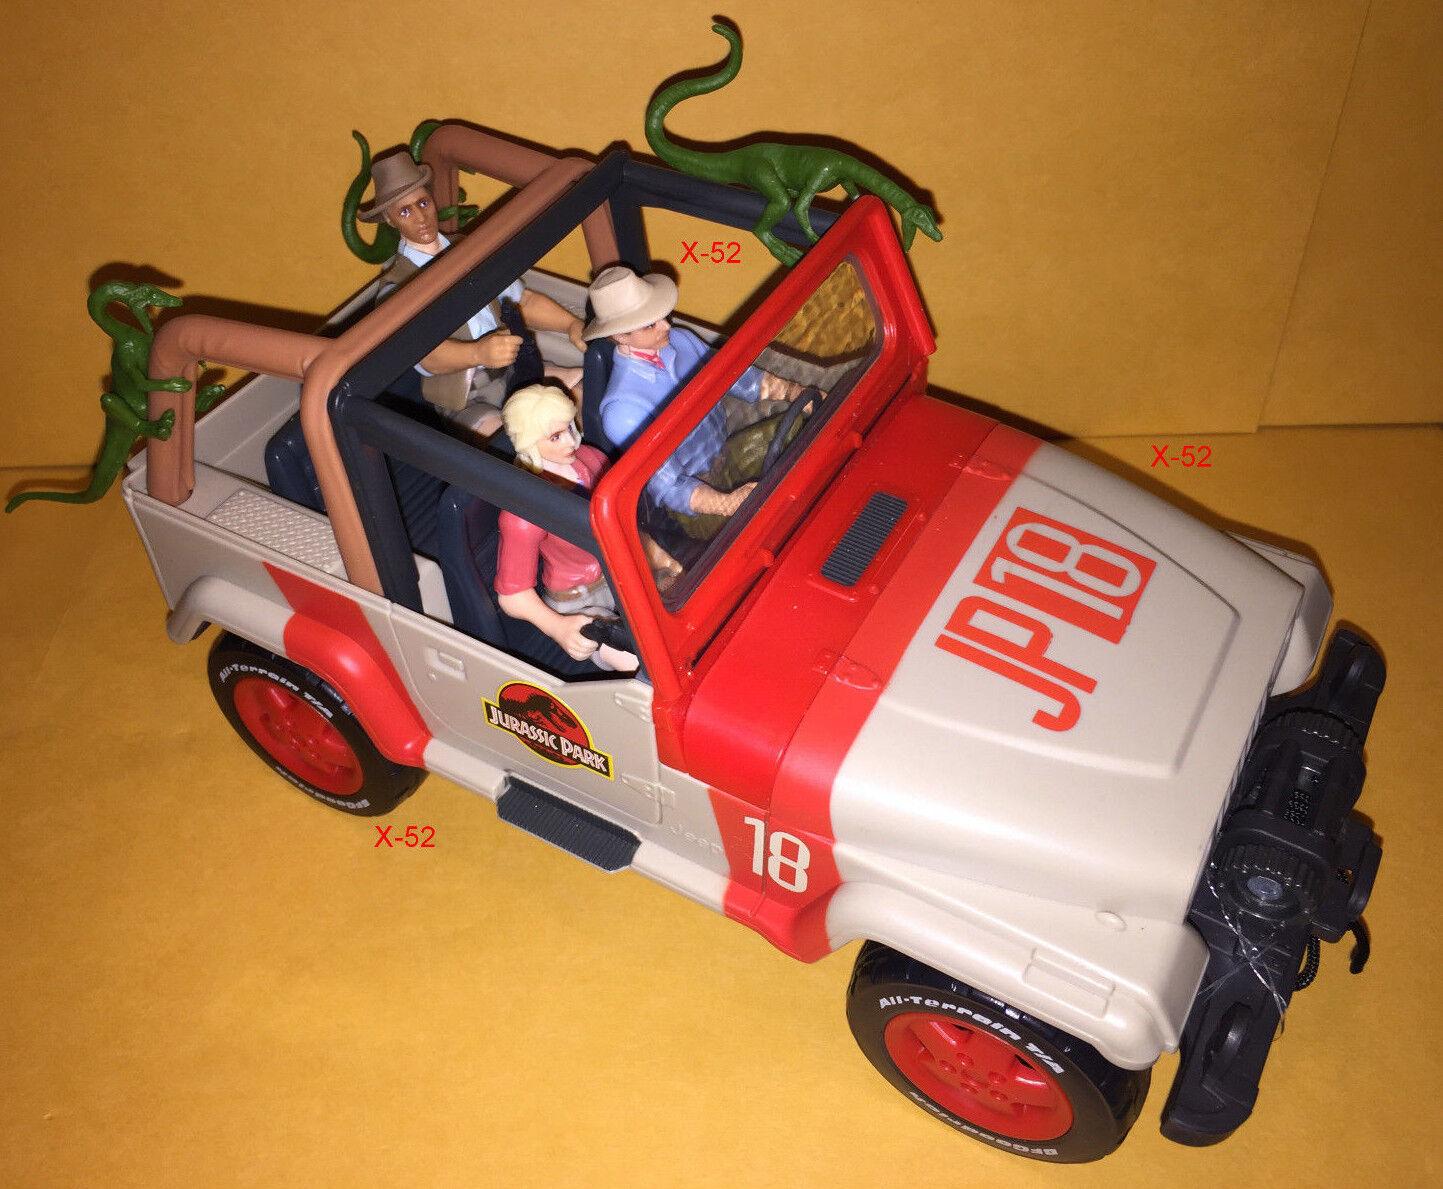 JURASSIC PARK toy JEEP WRANGLER car JP18 + 3 FIGURE lot TOY jurrasic world